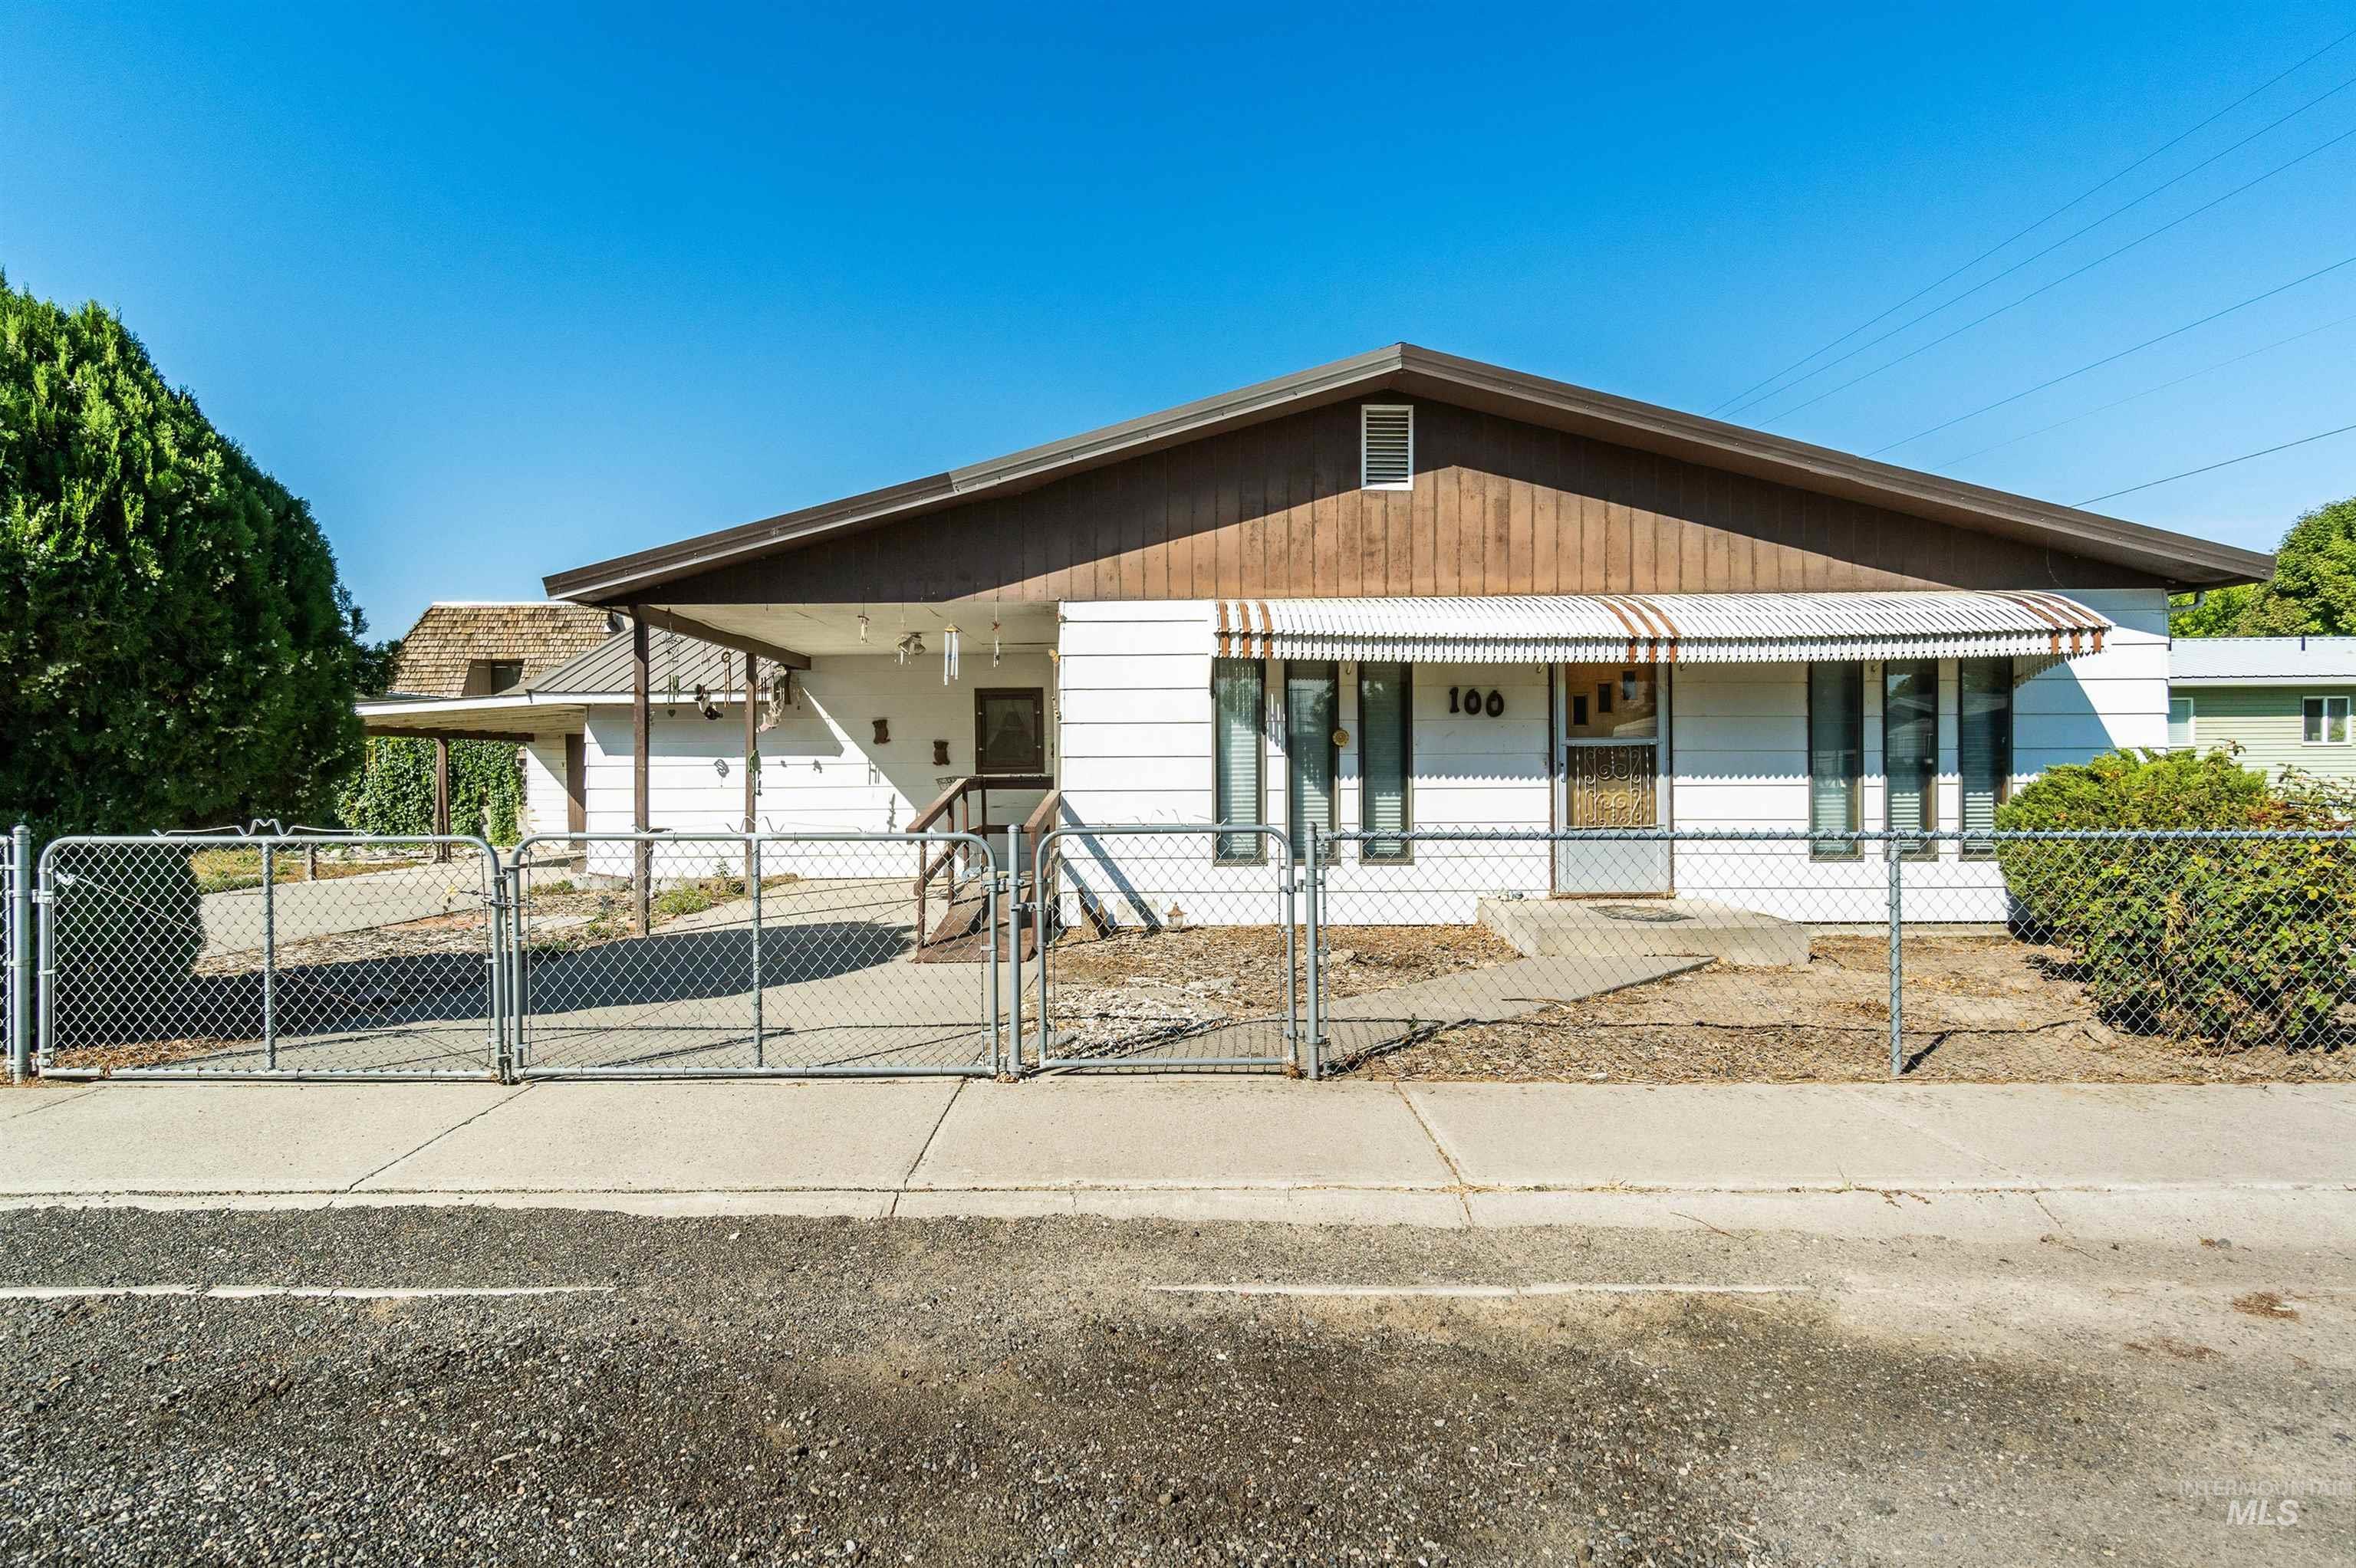 100 N Boise St, Wendell, ID 83355